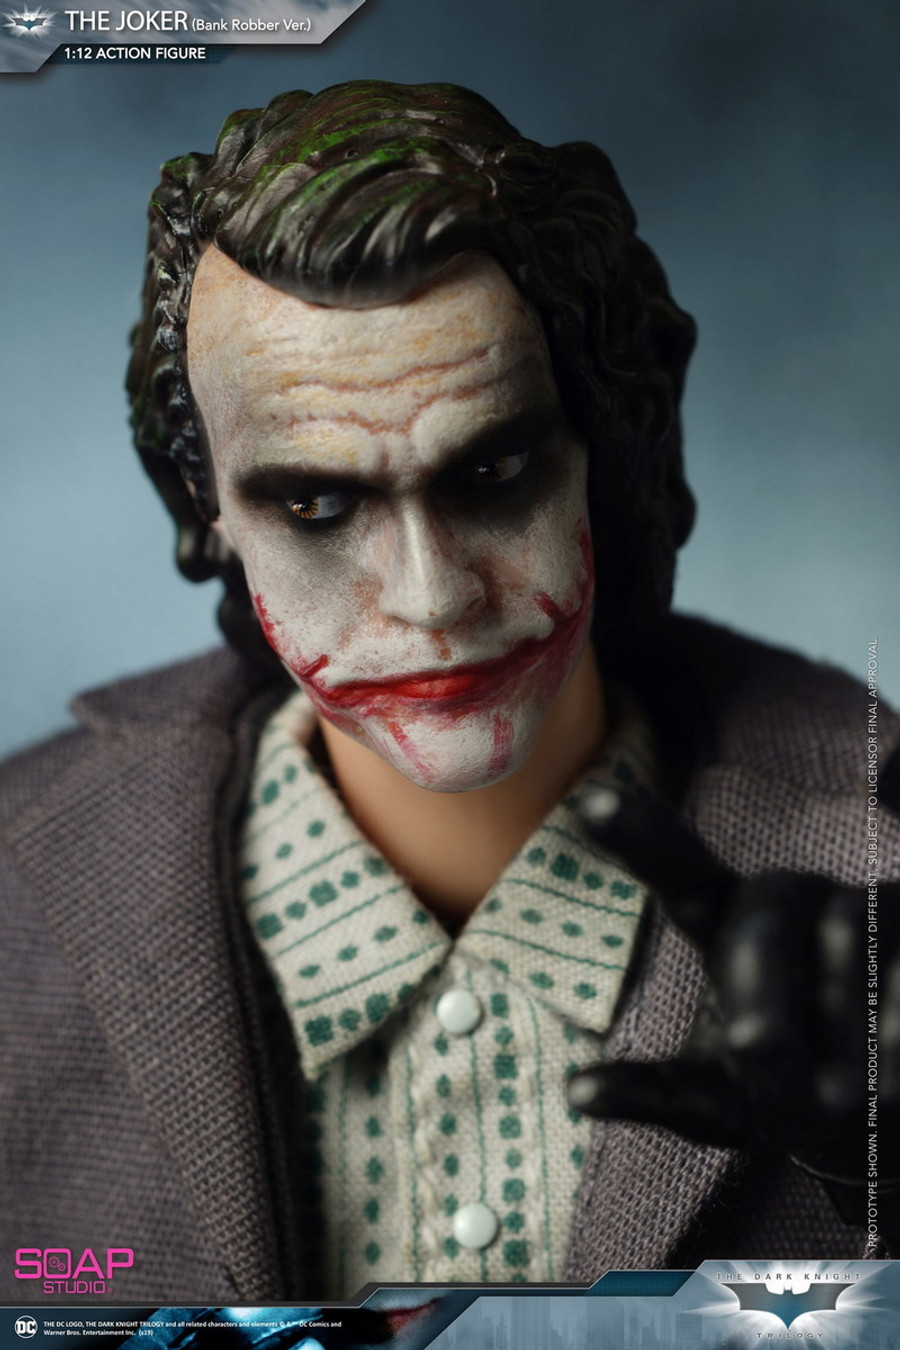 Soap Studio - 1/12 The Joker - Robbed Version